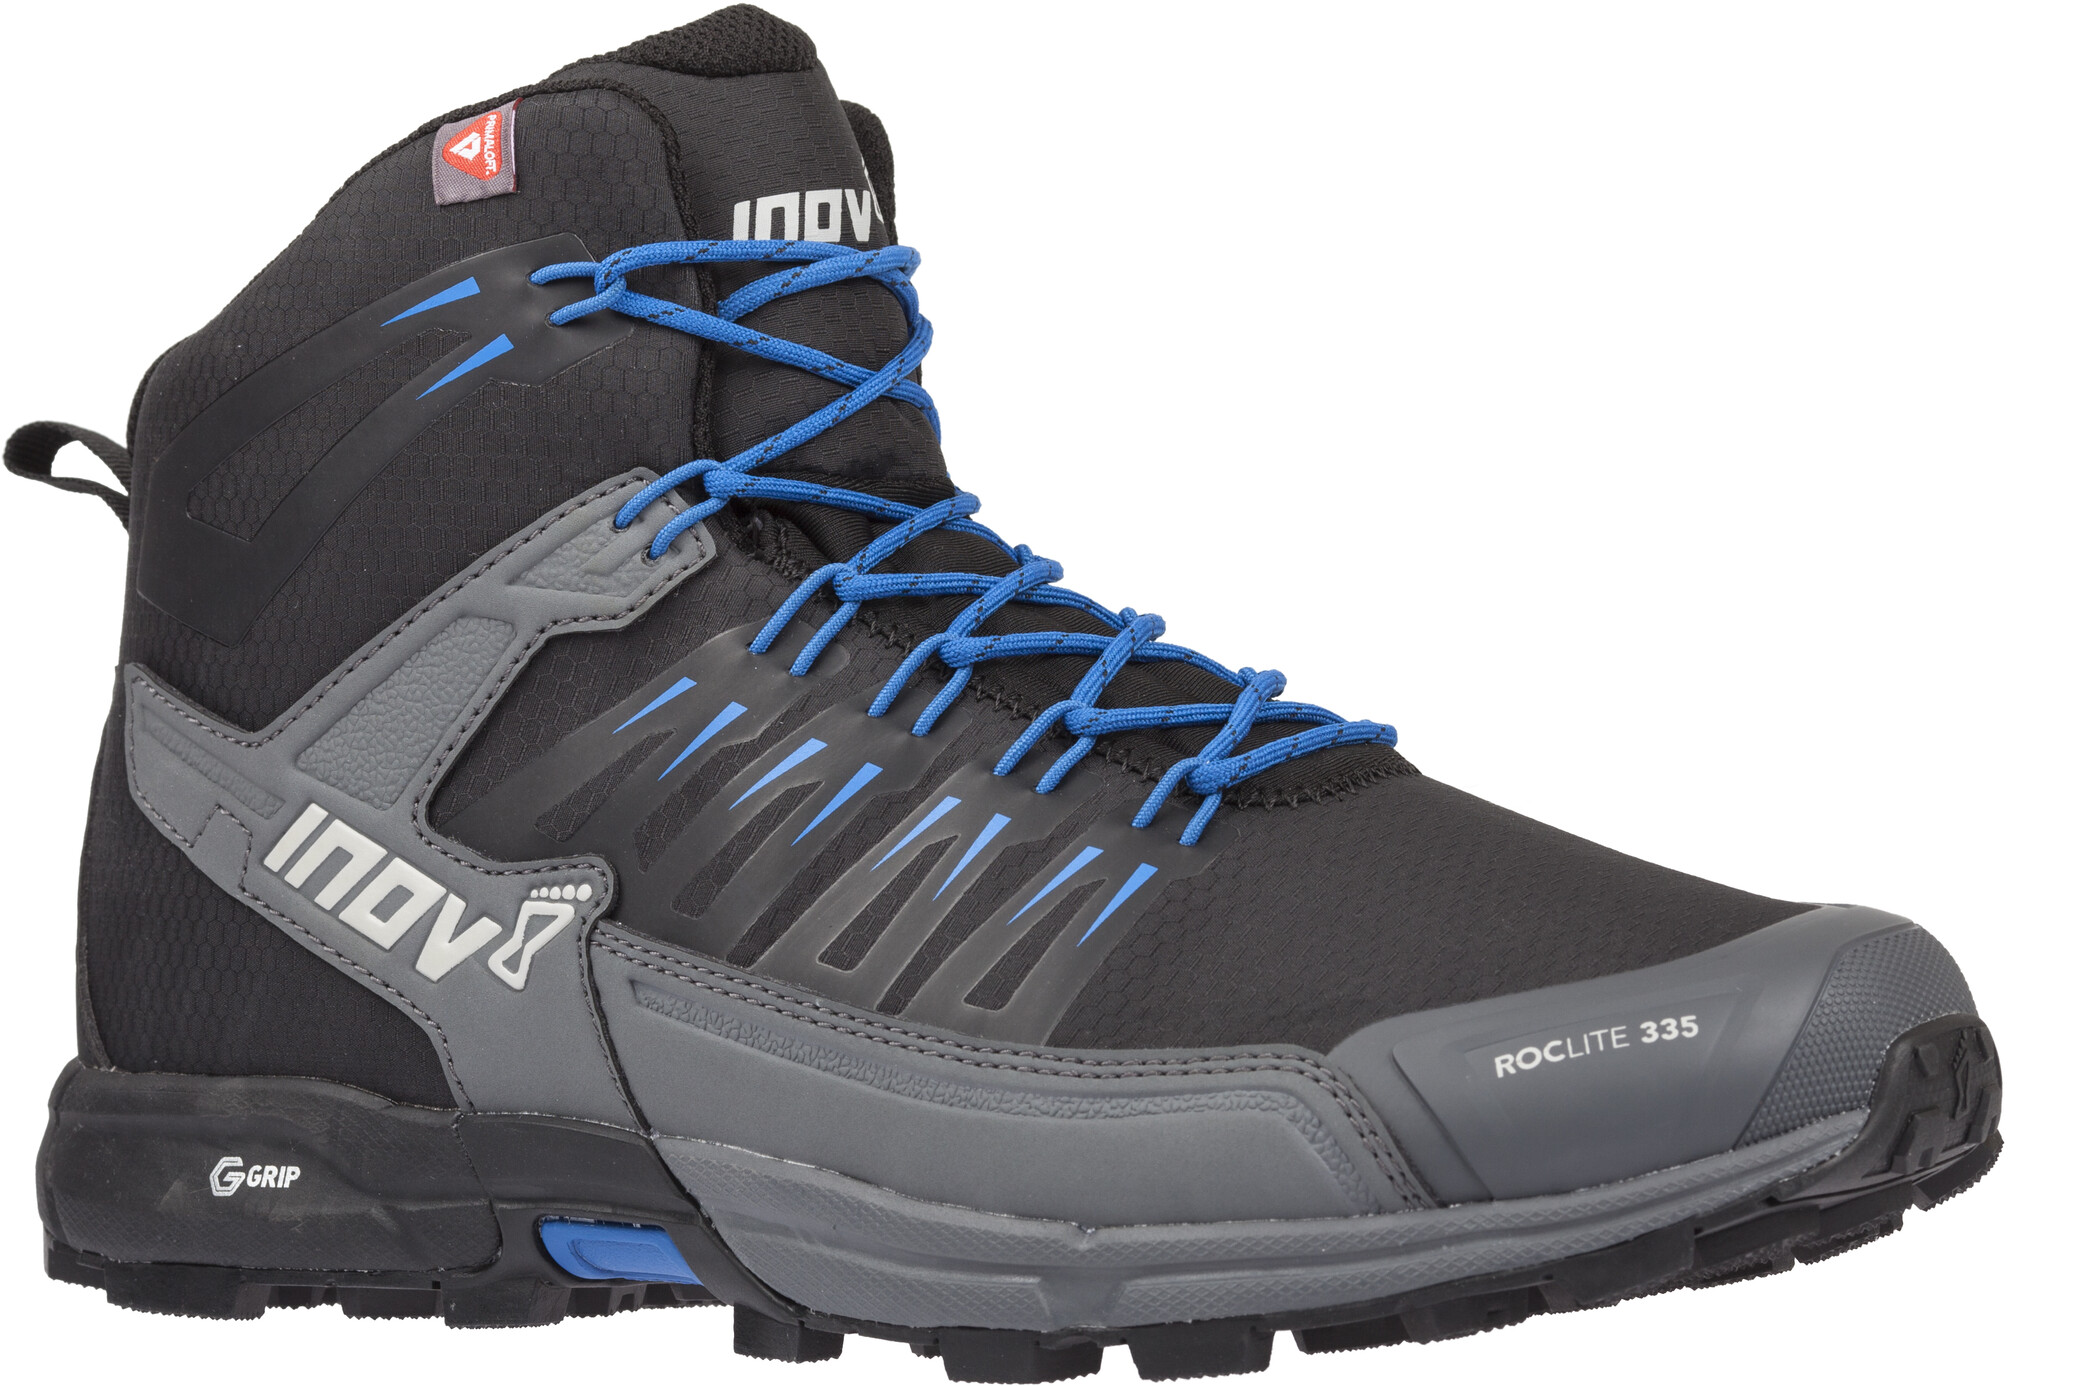 inov-8 Roclite 335 Sko, black/blue (2019)   Shoes and overlays